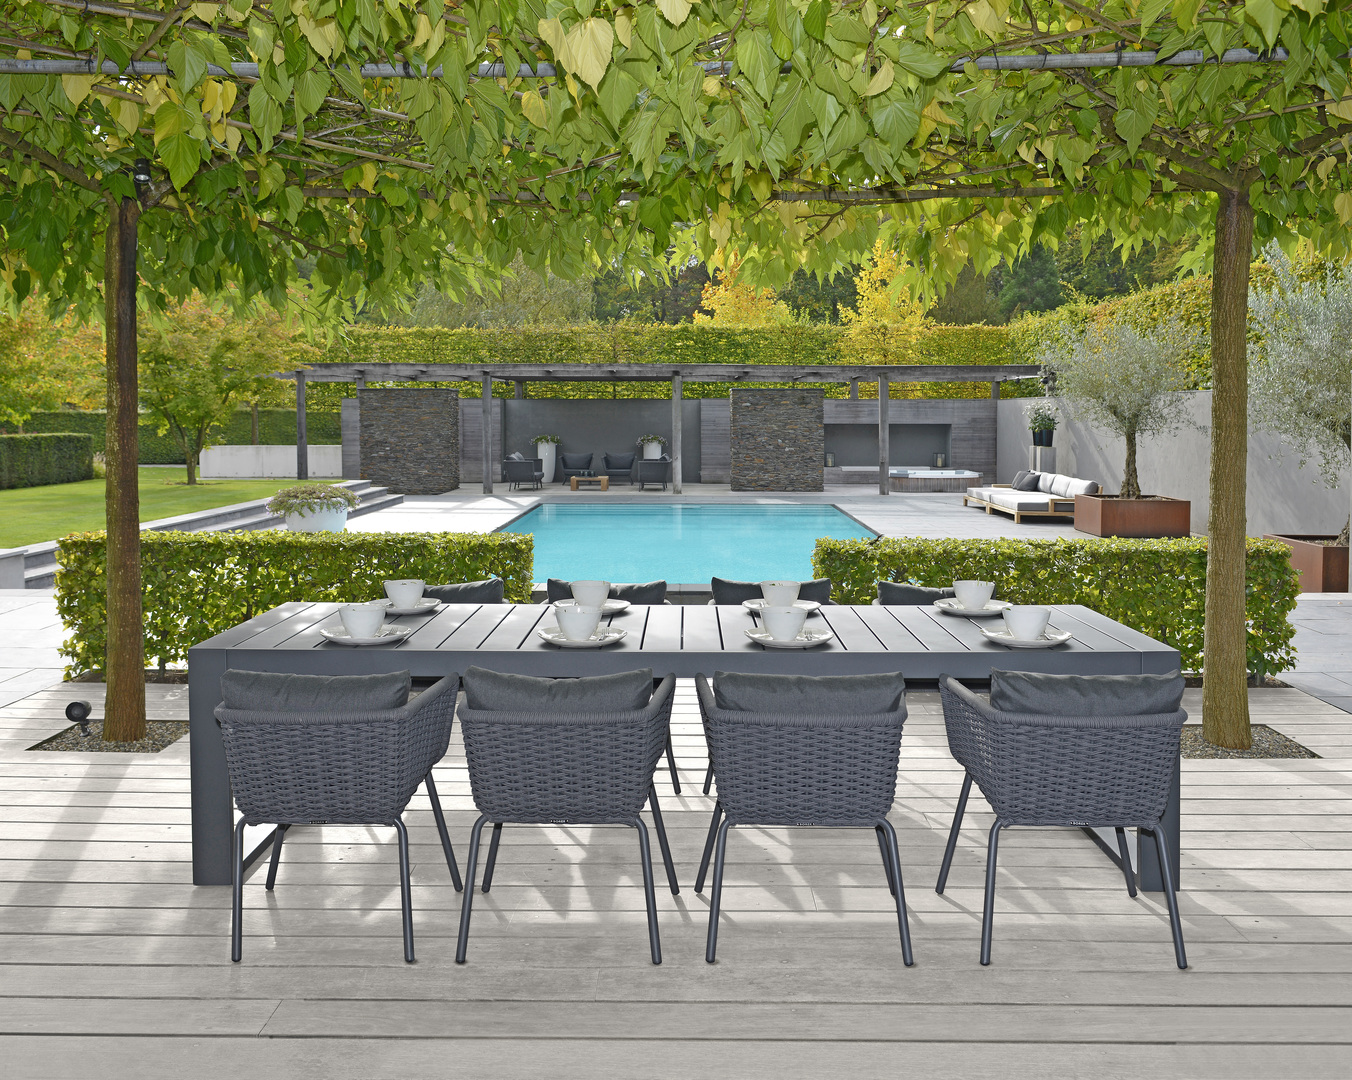 2018 Borek rope Valldemossa chair, lounge chair & sofa - alu Vitoria table - teak Cadiz daybed & coffee table Studio Borek.jpg